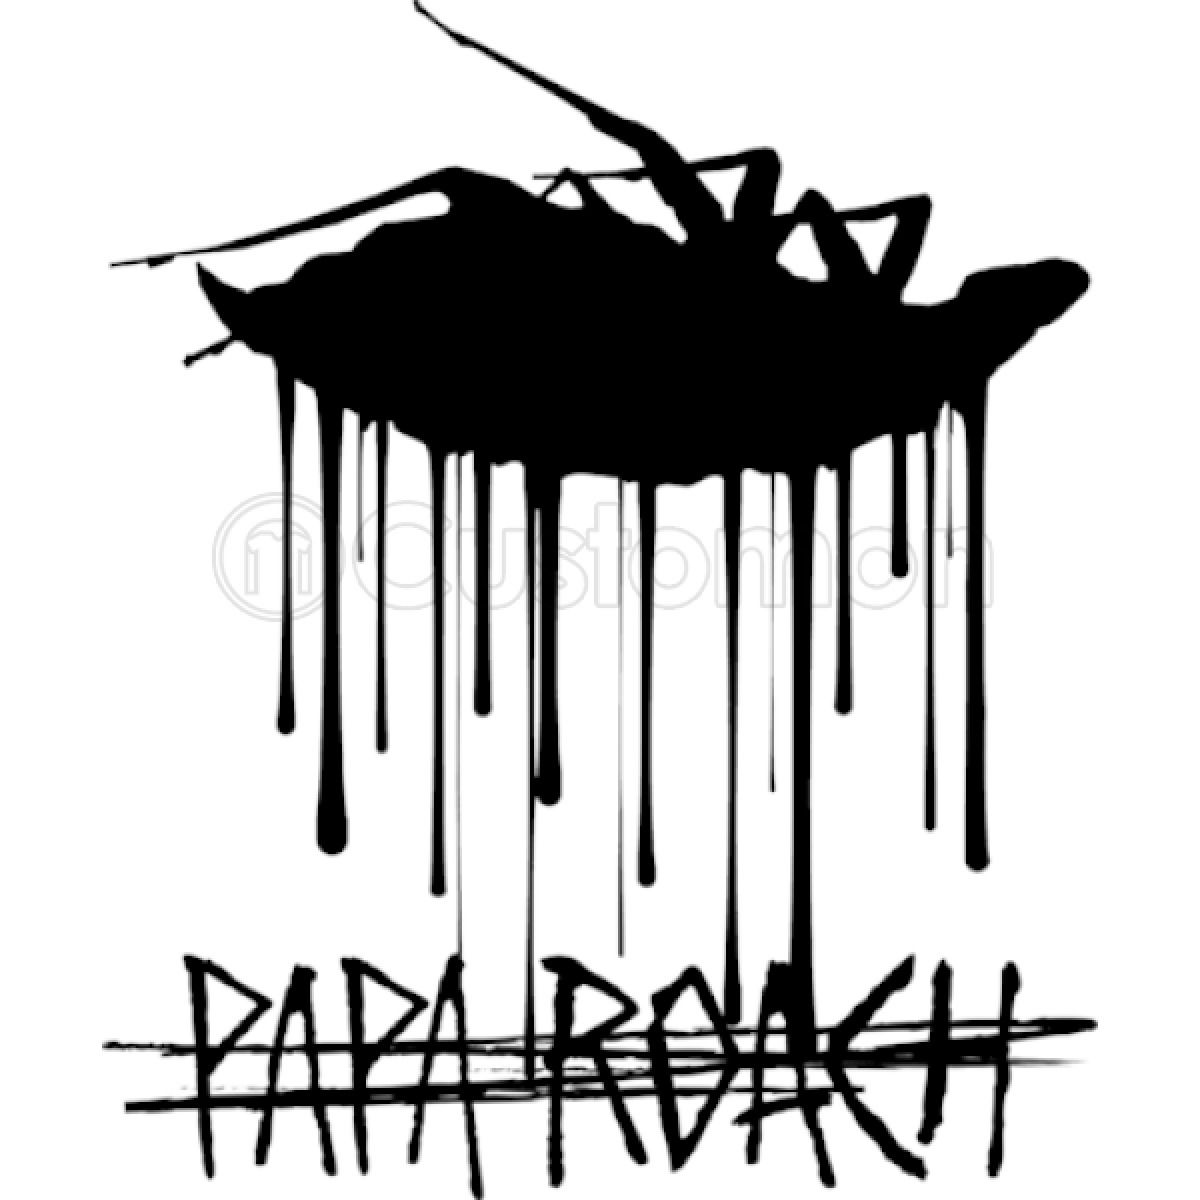 Papa roach clipart clipart transparent stock Papa Roach Kids Tank Top - Customon clipart transparent stock